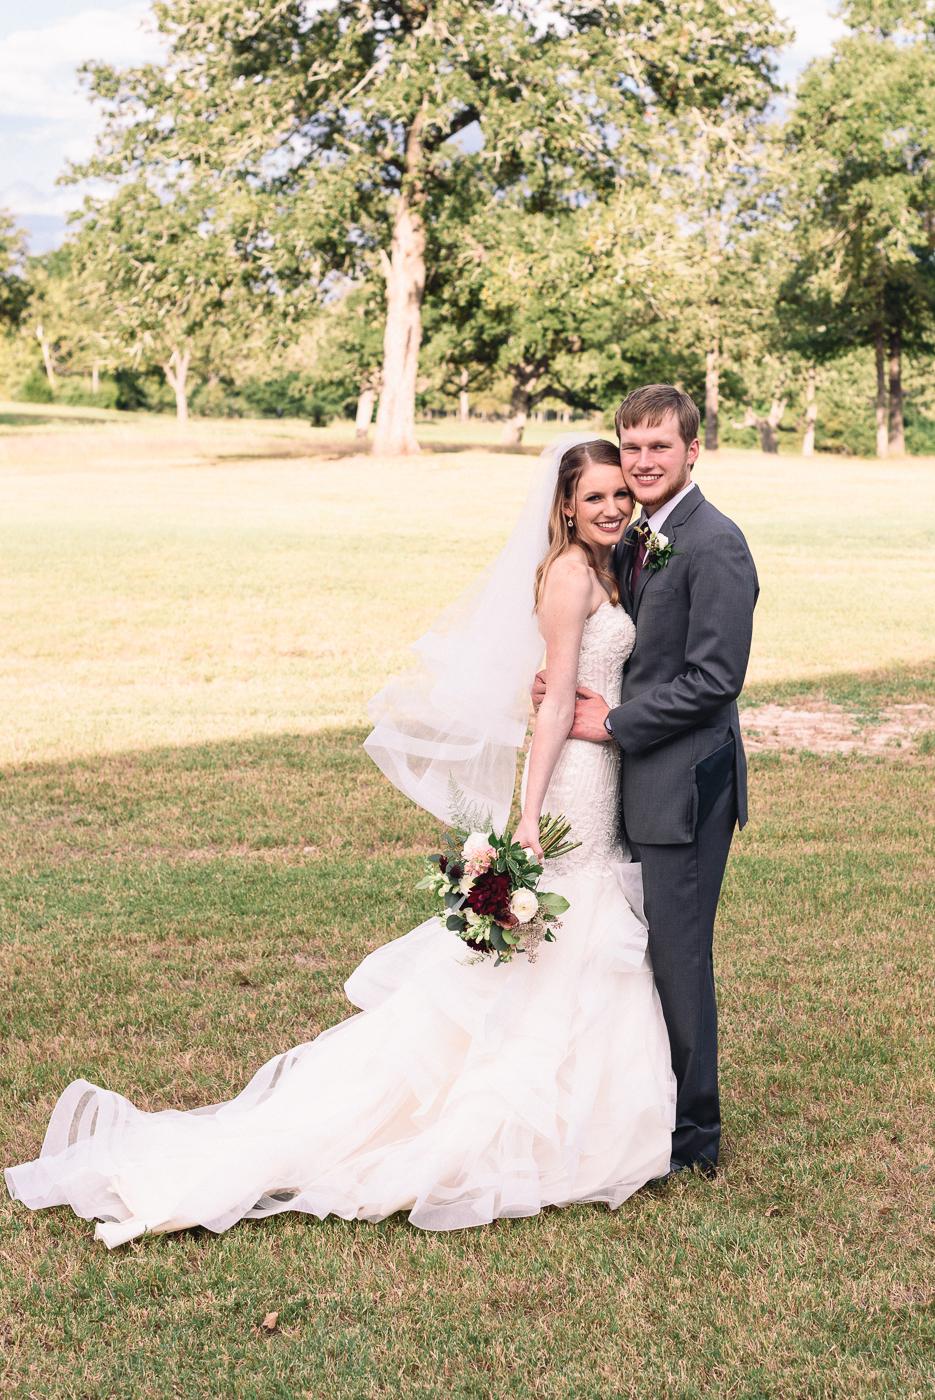 Husband and wife wedding portrait broken arrow ranch college station wedding gown train